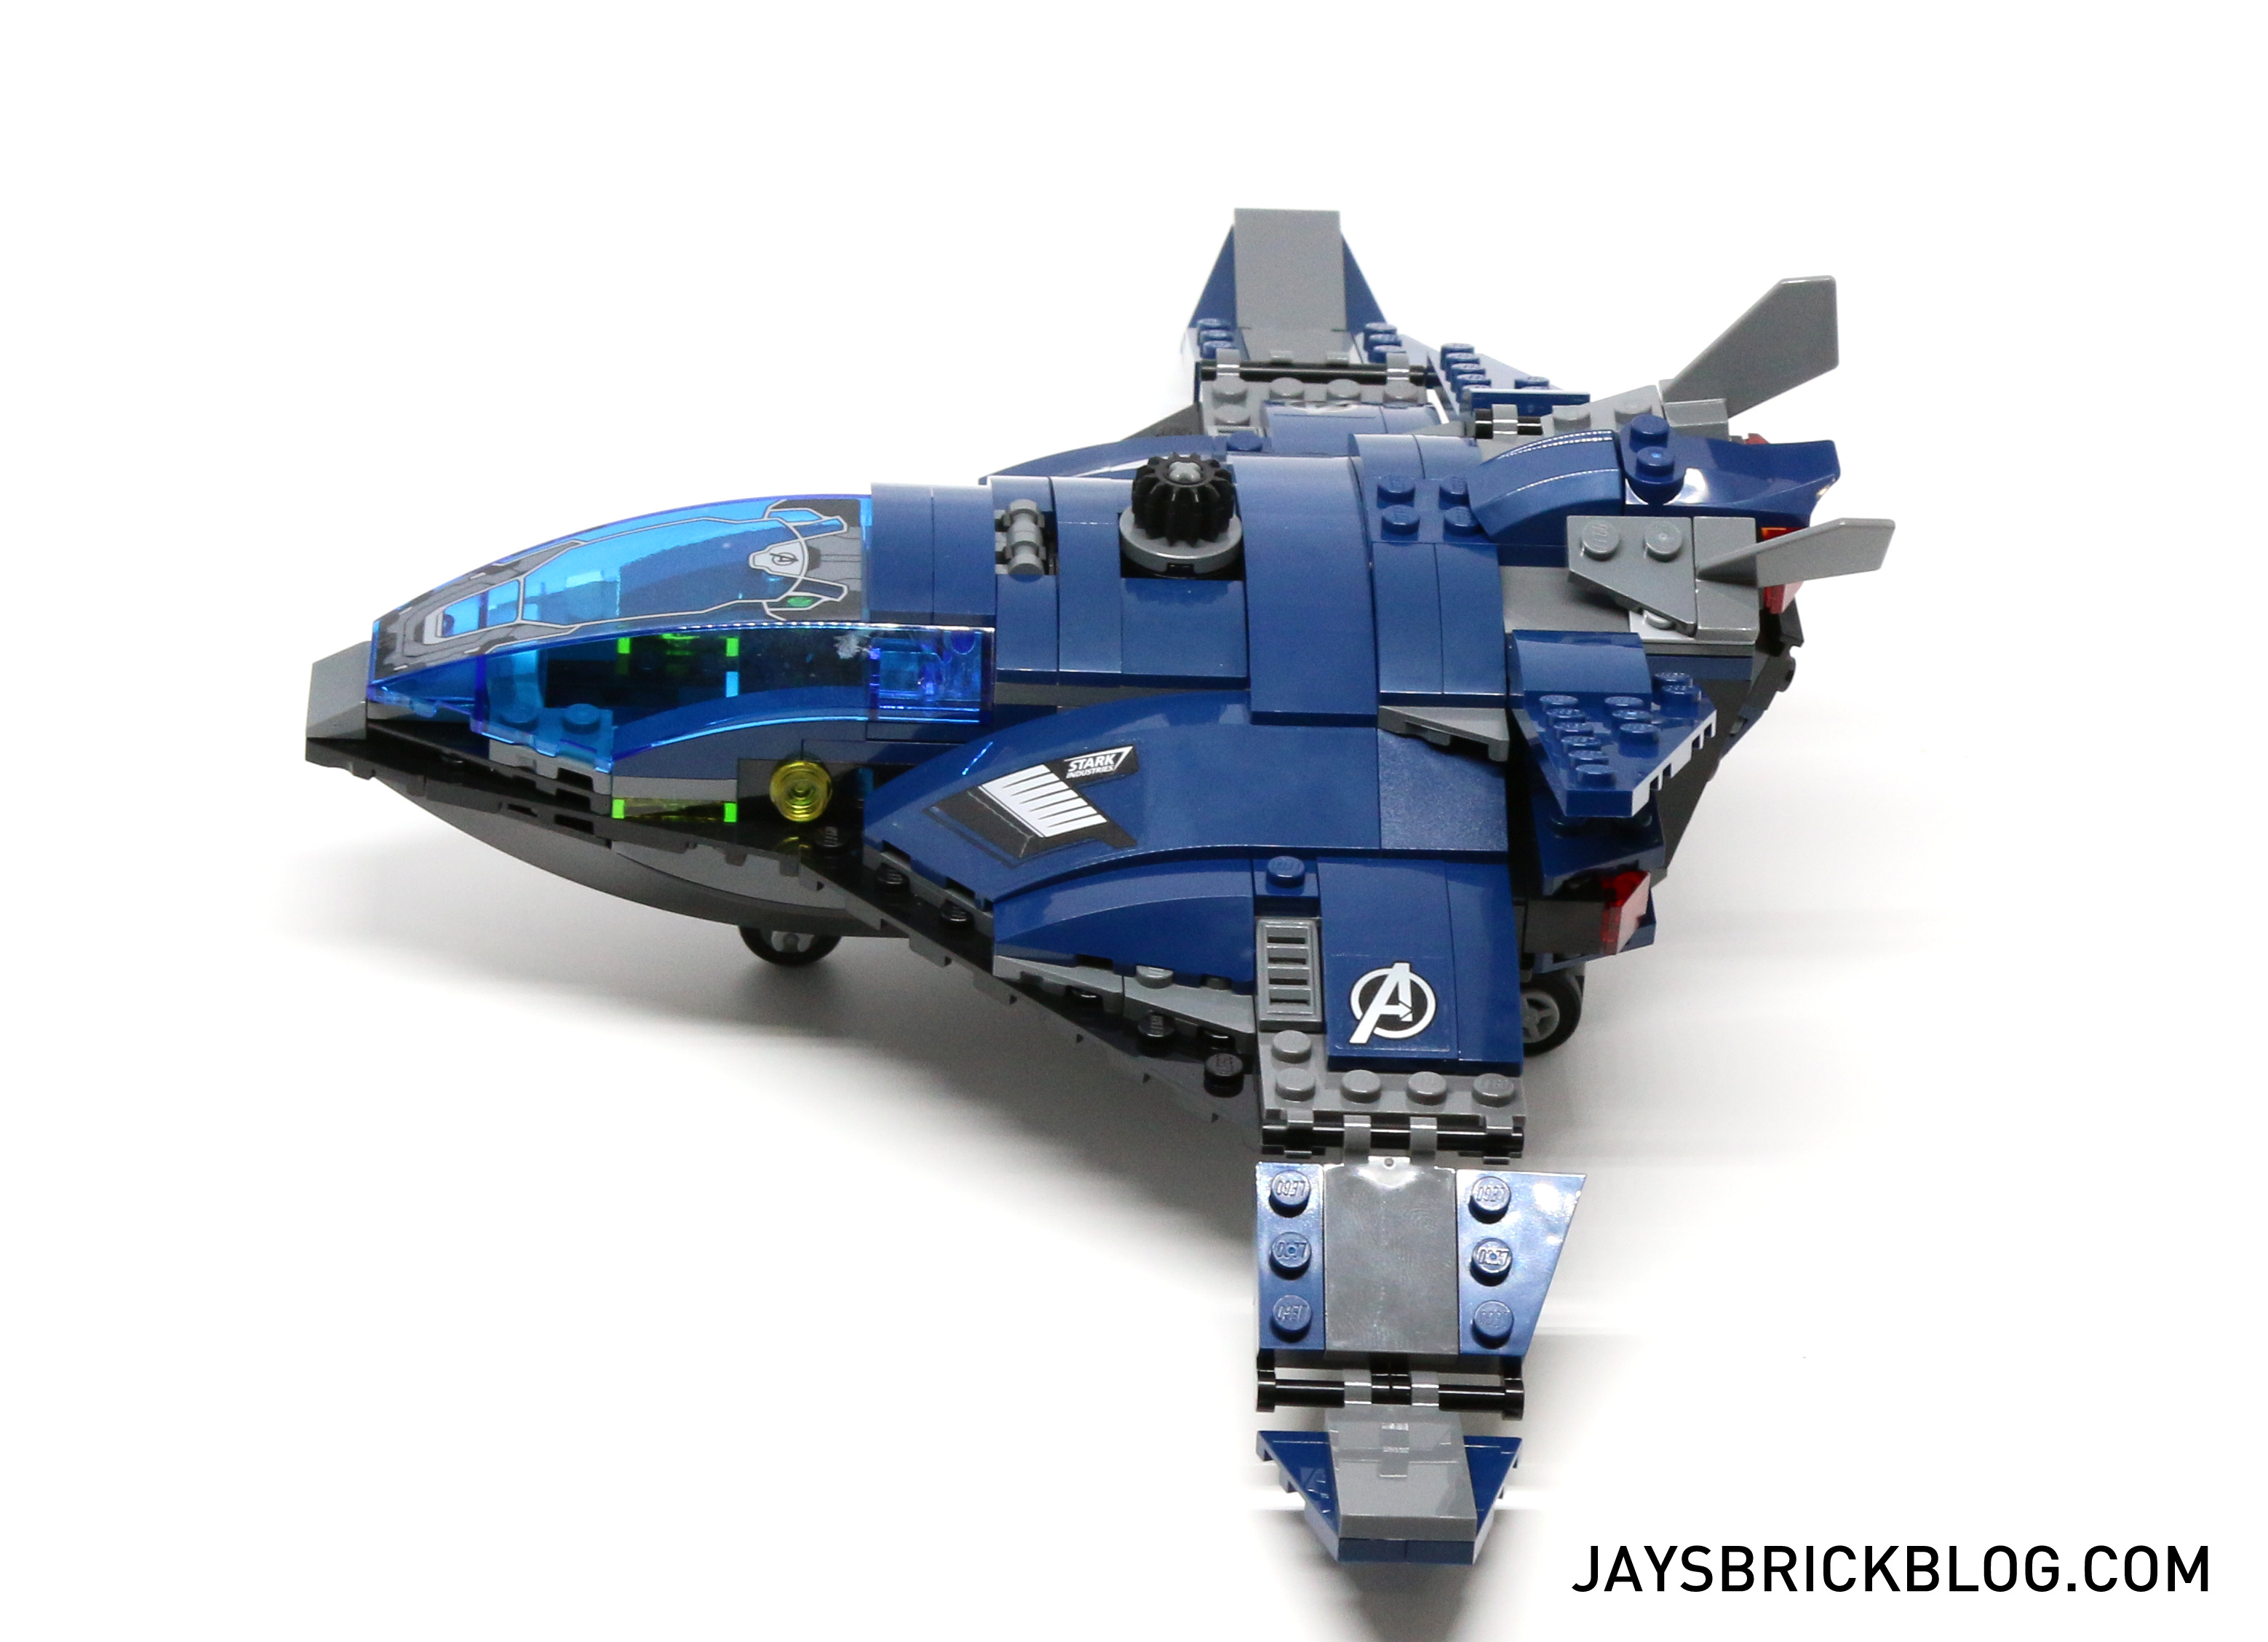 Review: LEGO 76051 Super Hero Airport Battle